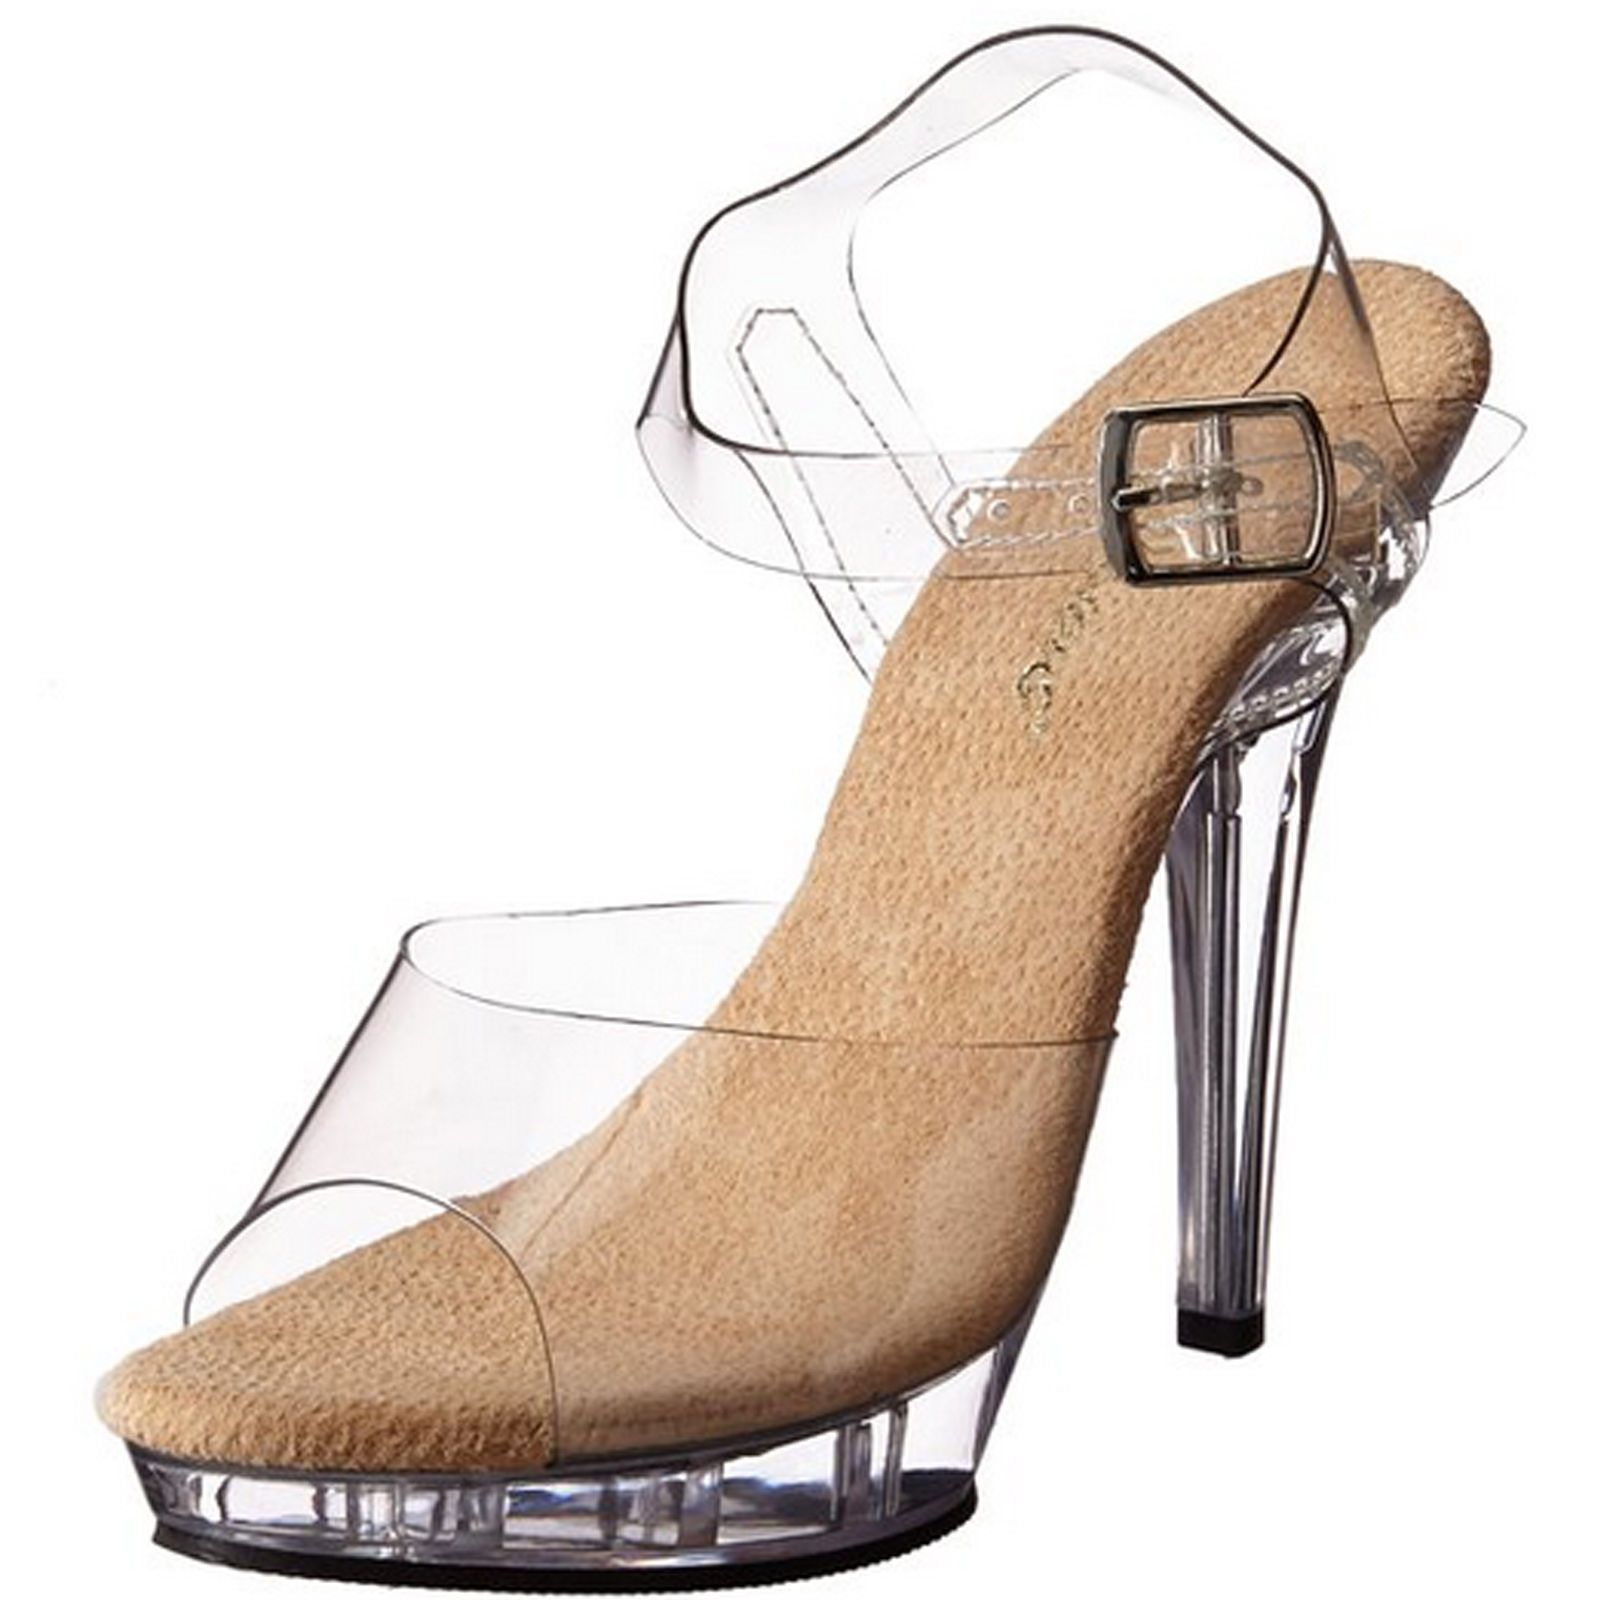 5b041e5b3b Fabulicious Platform Ankle Strap Sandal High Heel Stripper Shoes Lip-108  Clear